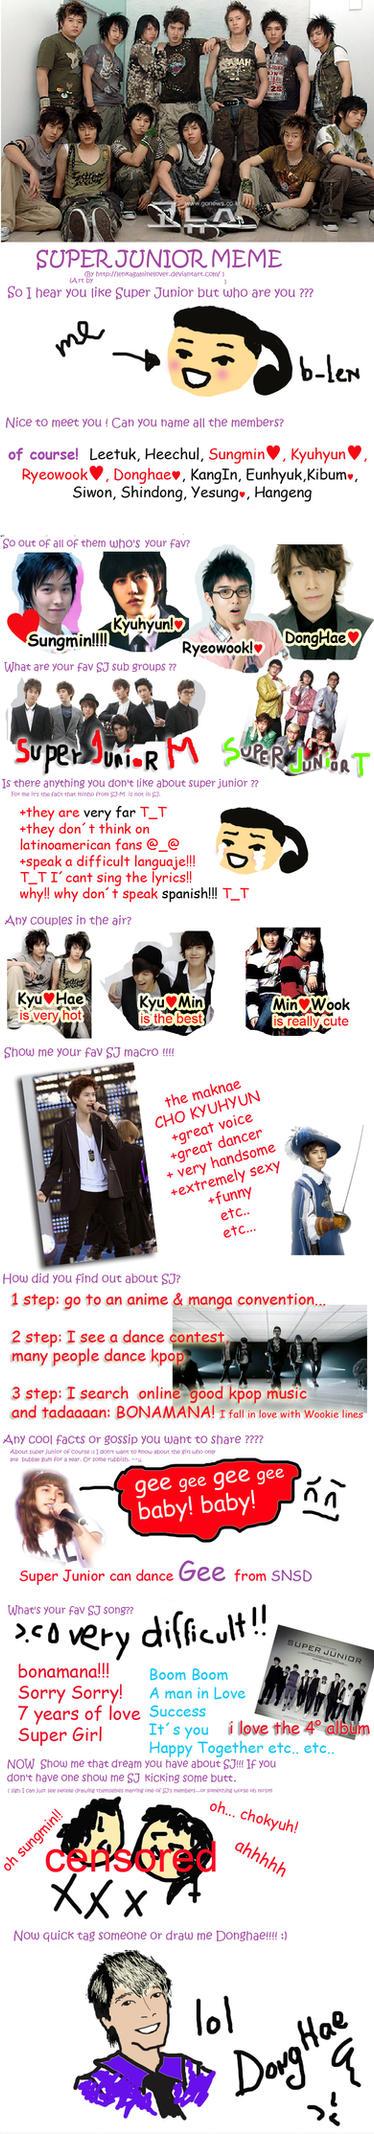 Super Junior Meme by BLen